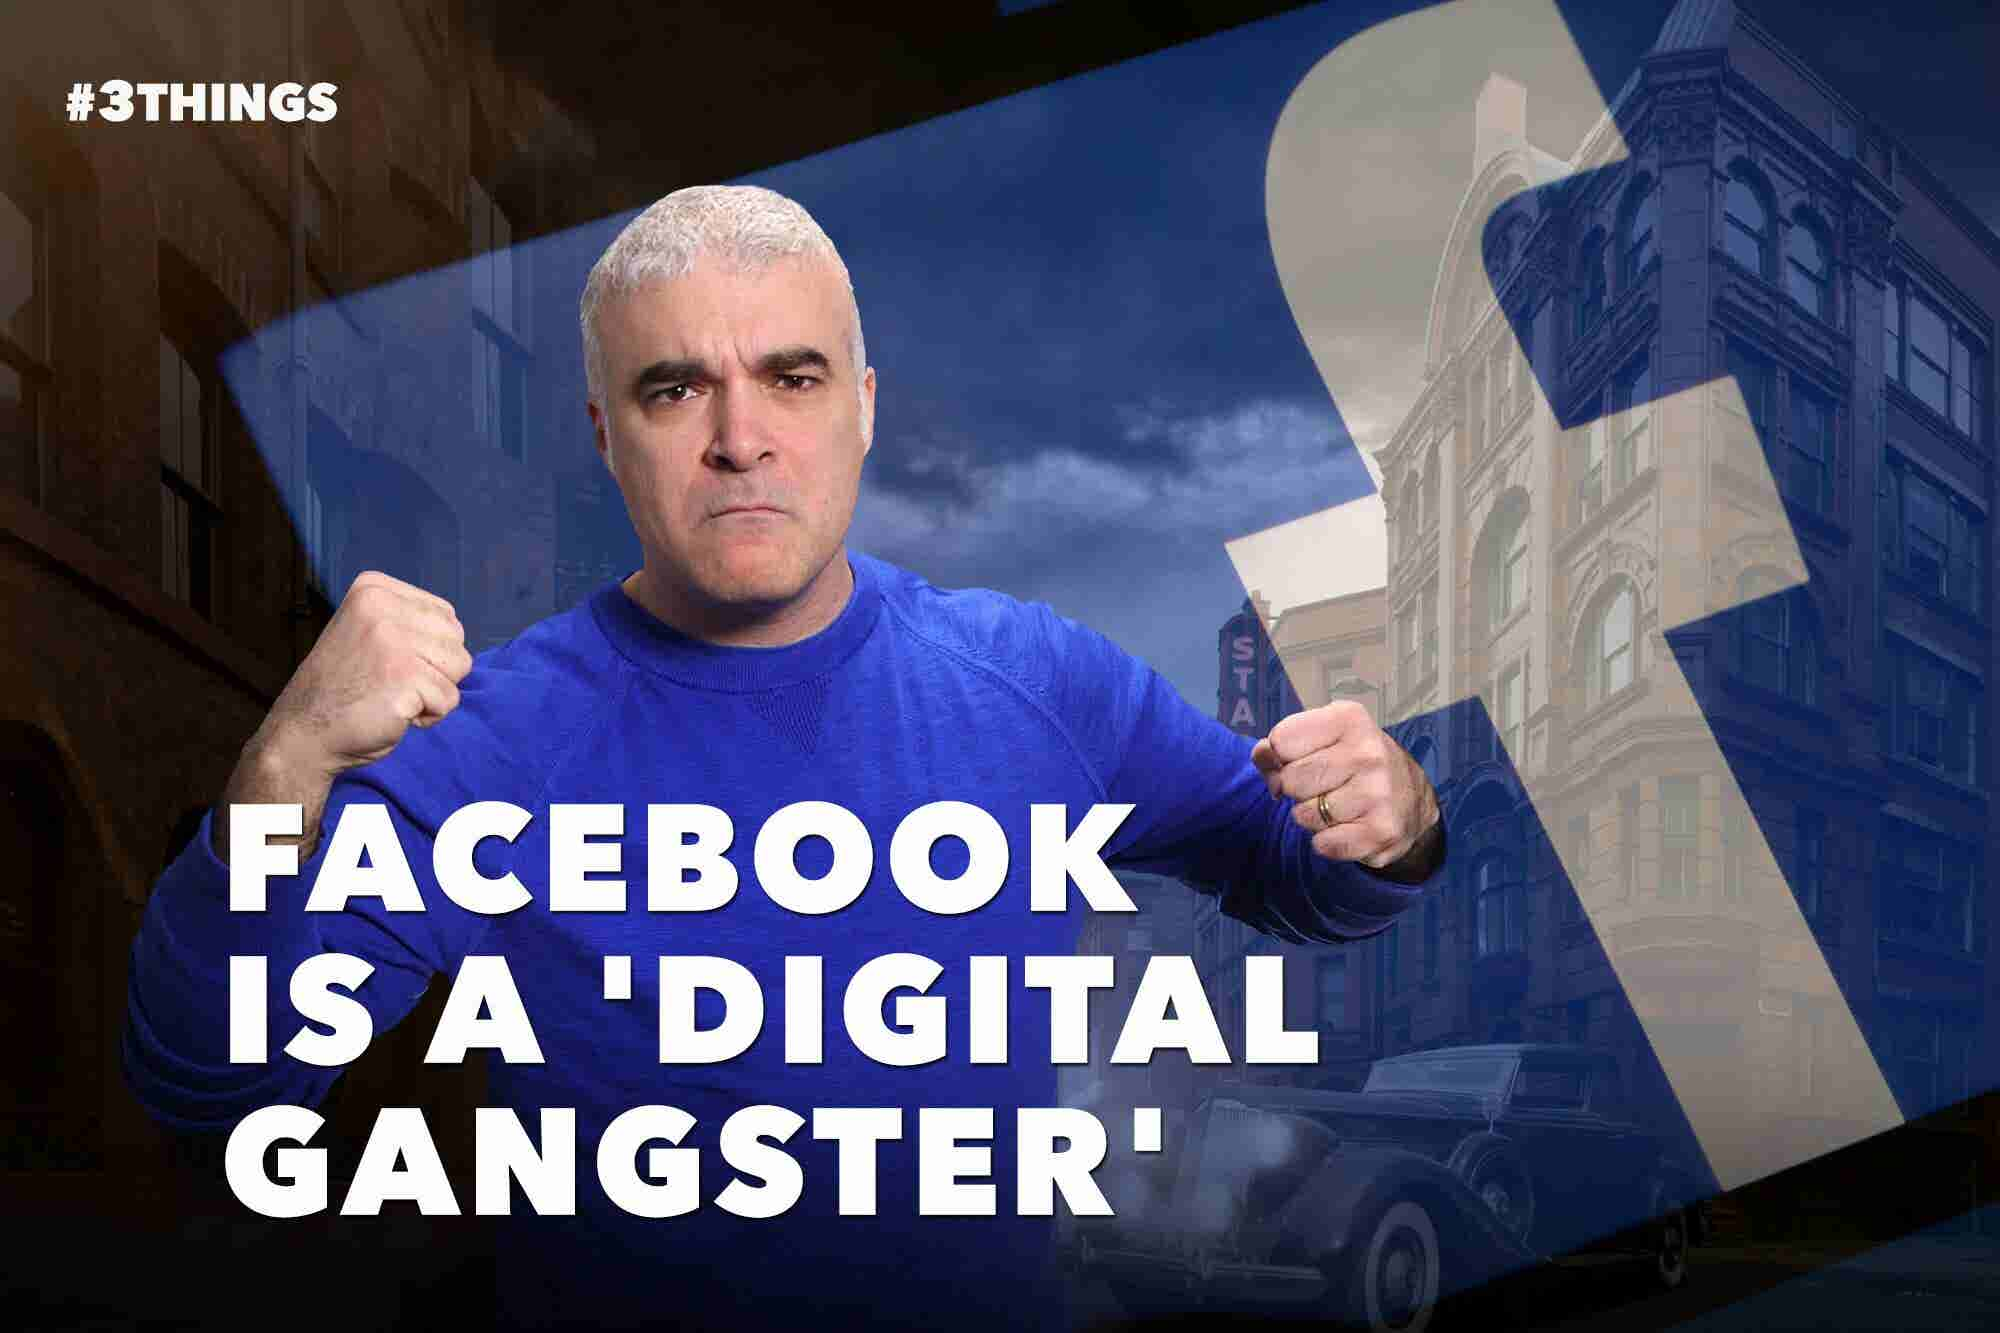 Facebook Is a 'Digital Gangster' (60-Second Video)